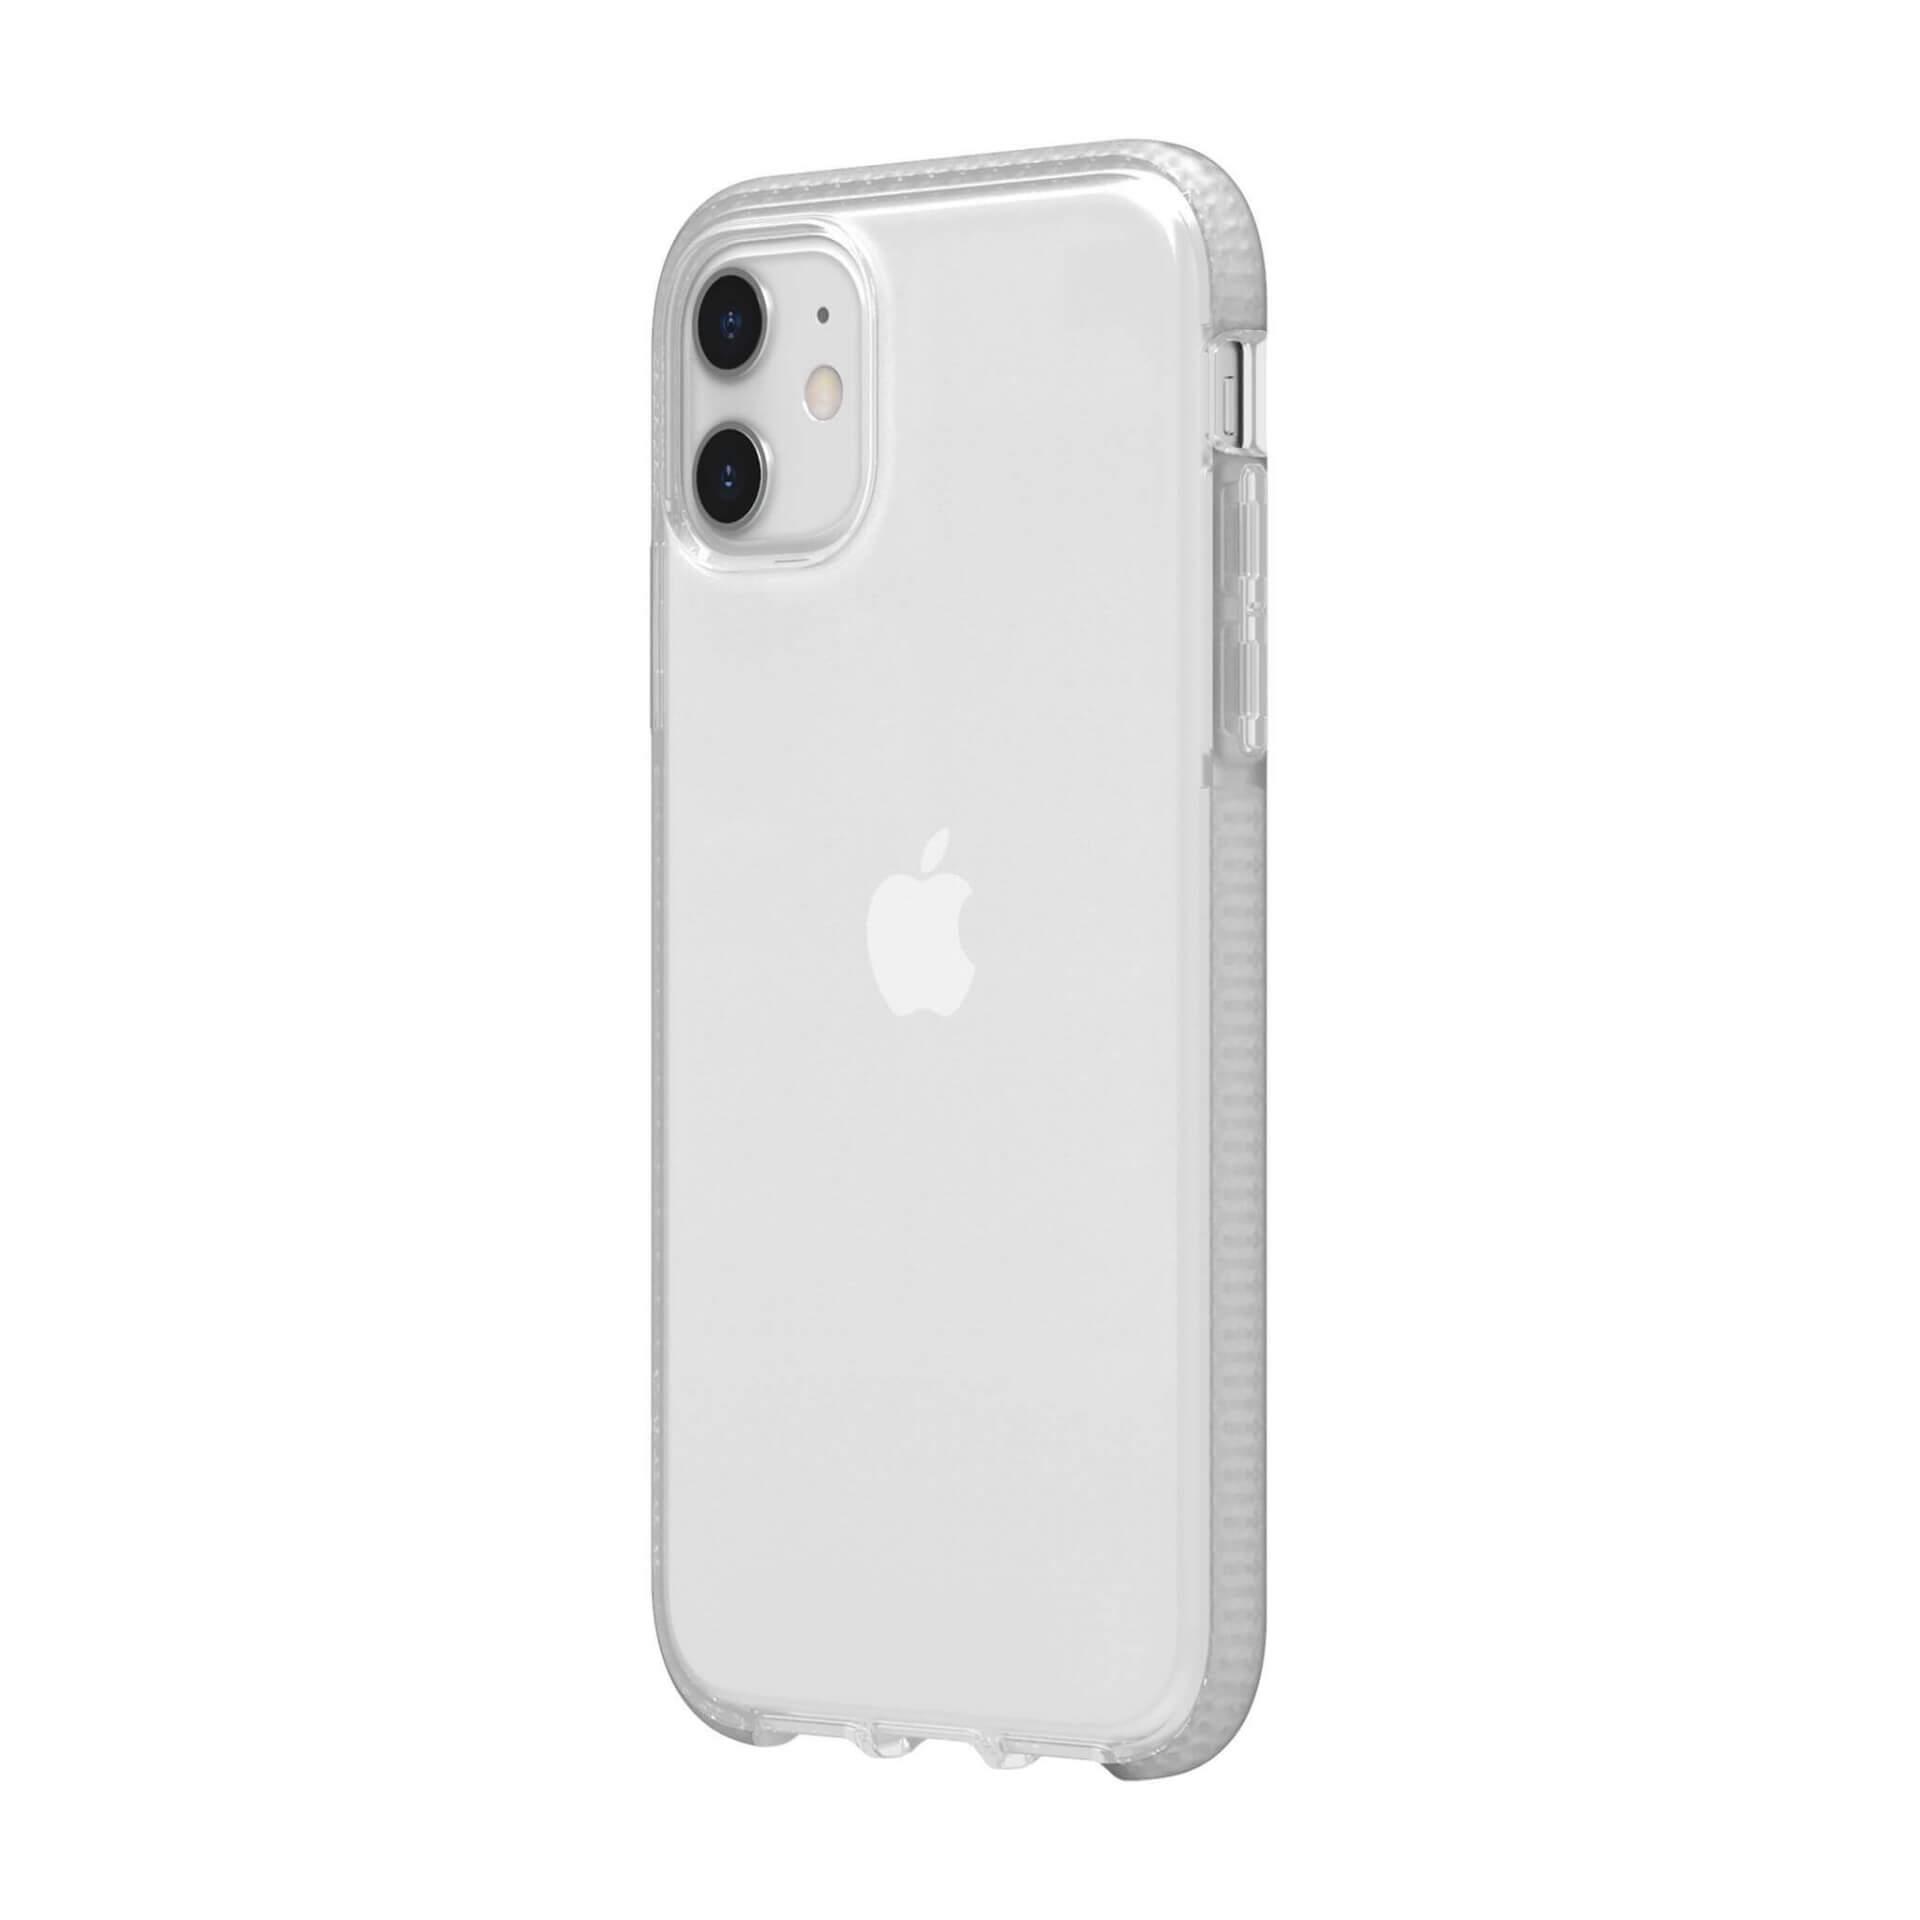 Griffin Survivor Clear Case — хибриден удароустойчив кейс за iPhone 11 (прозрачен) - 2